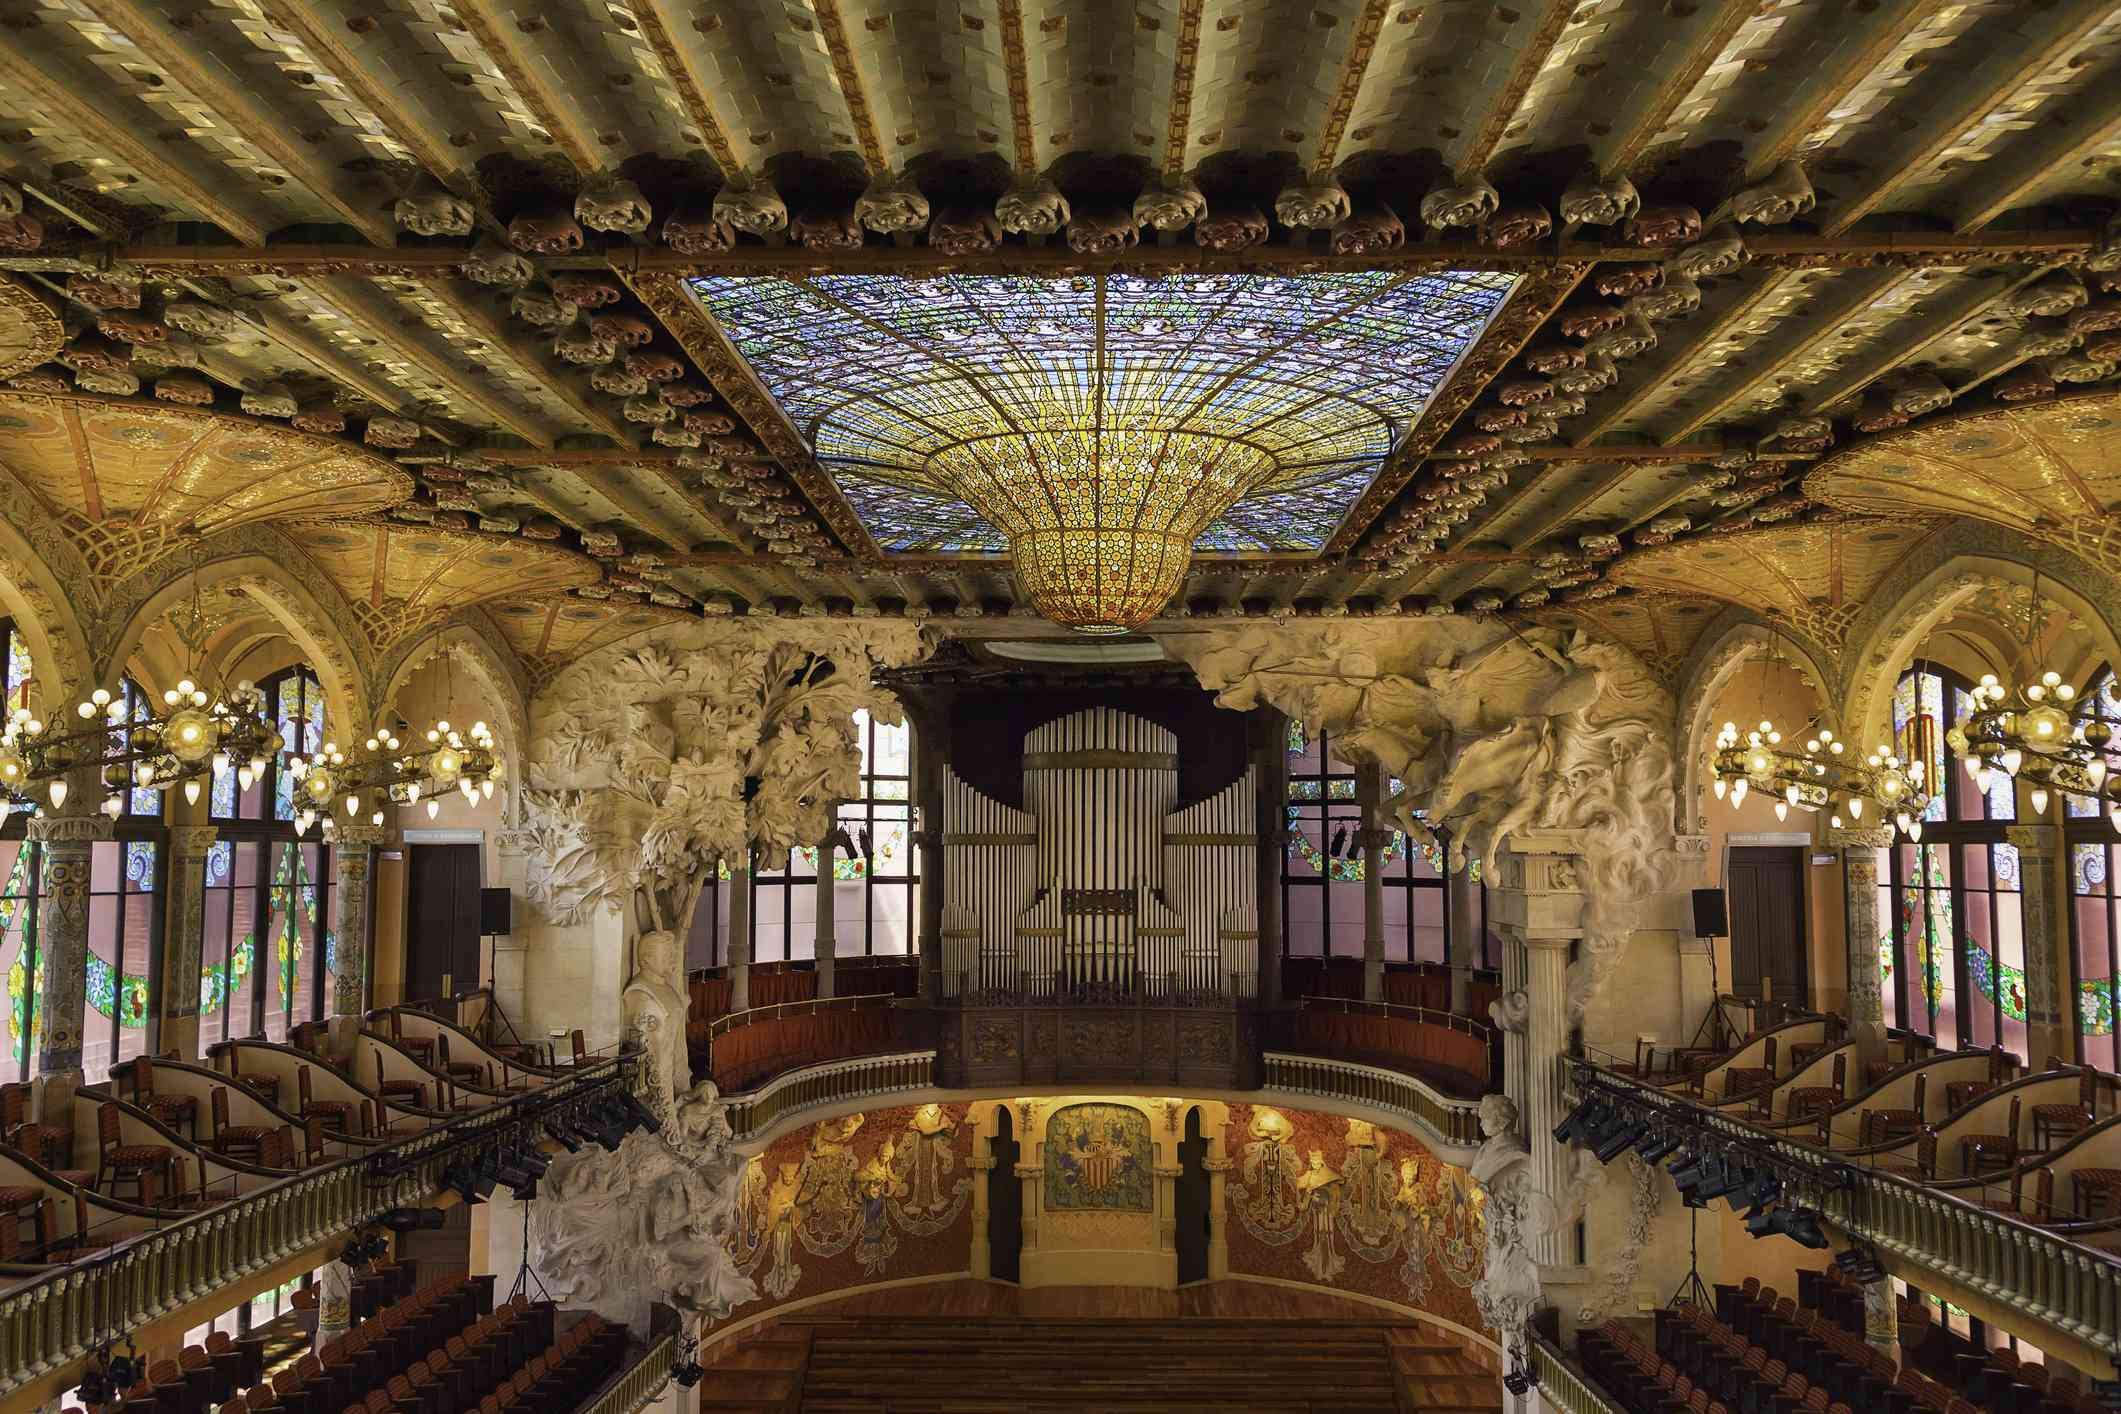 Interior of Concert Hall, Palau de la Musica Catalana, Barcelona